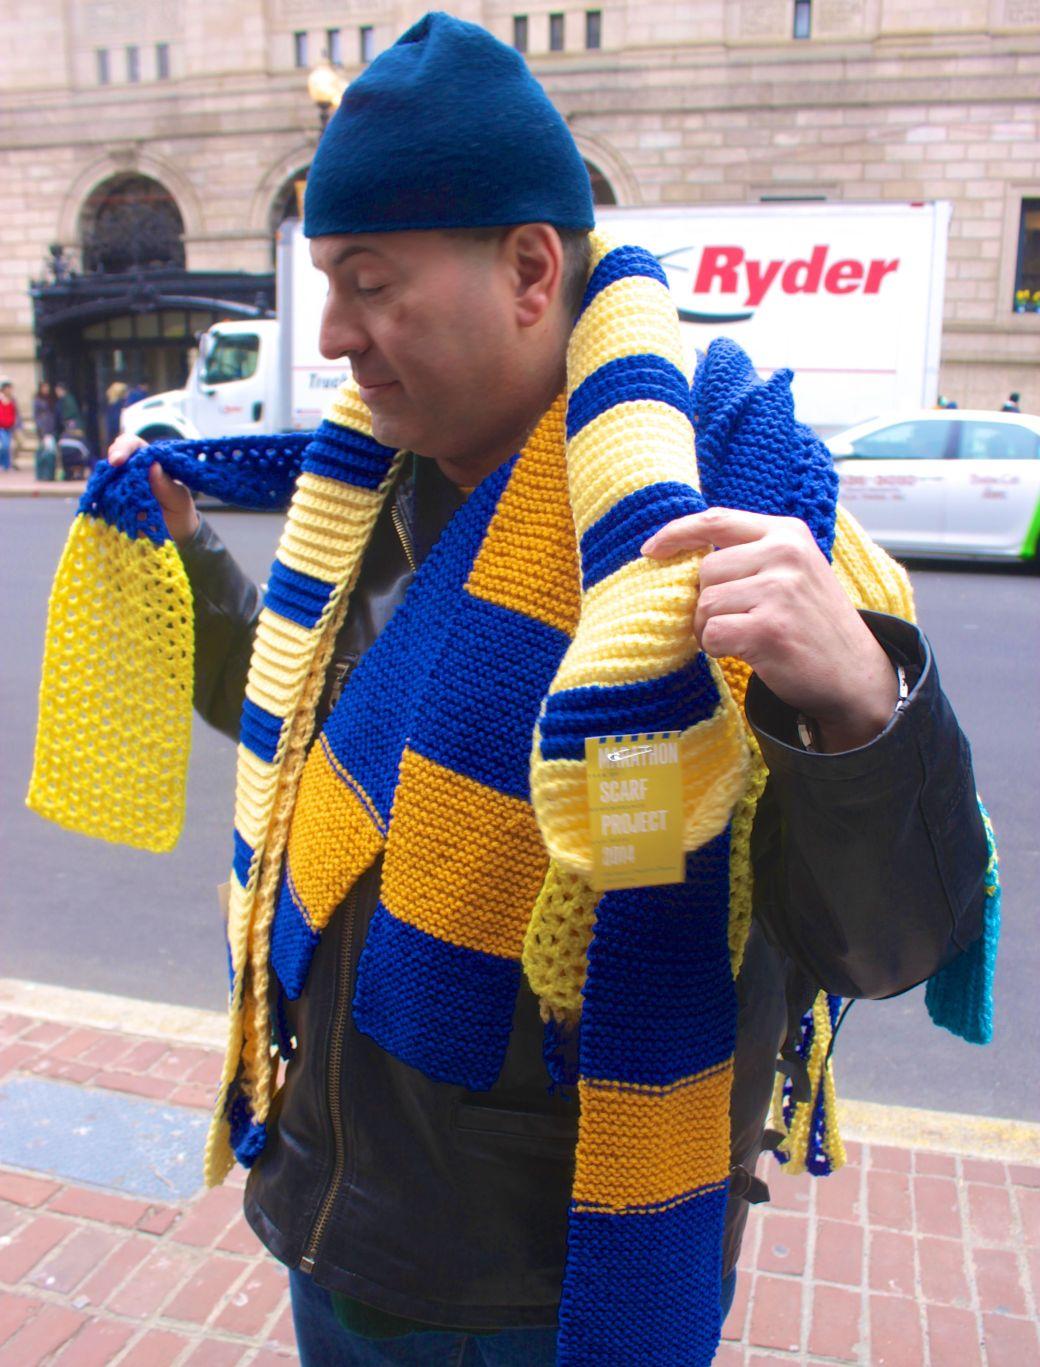 boston old south church marathon scarf distribution 7